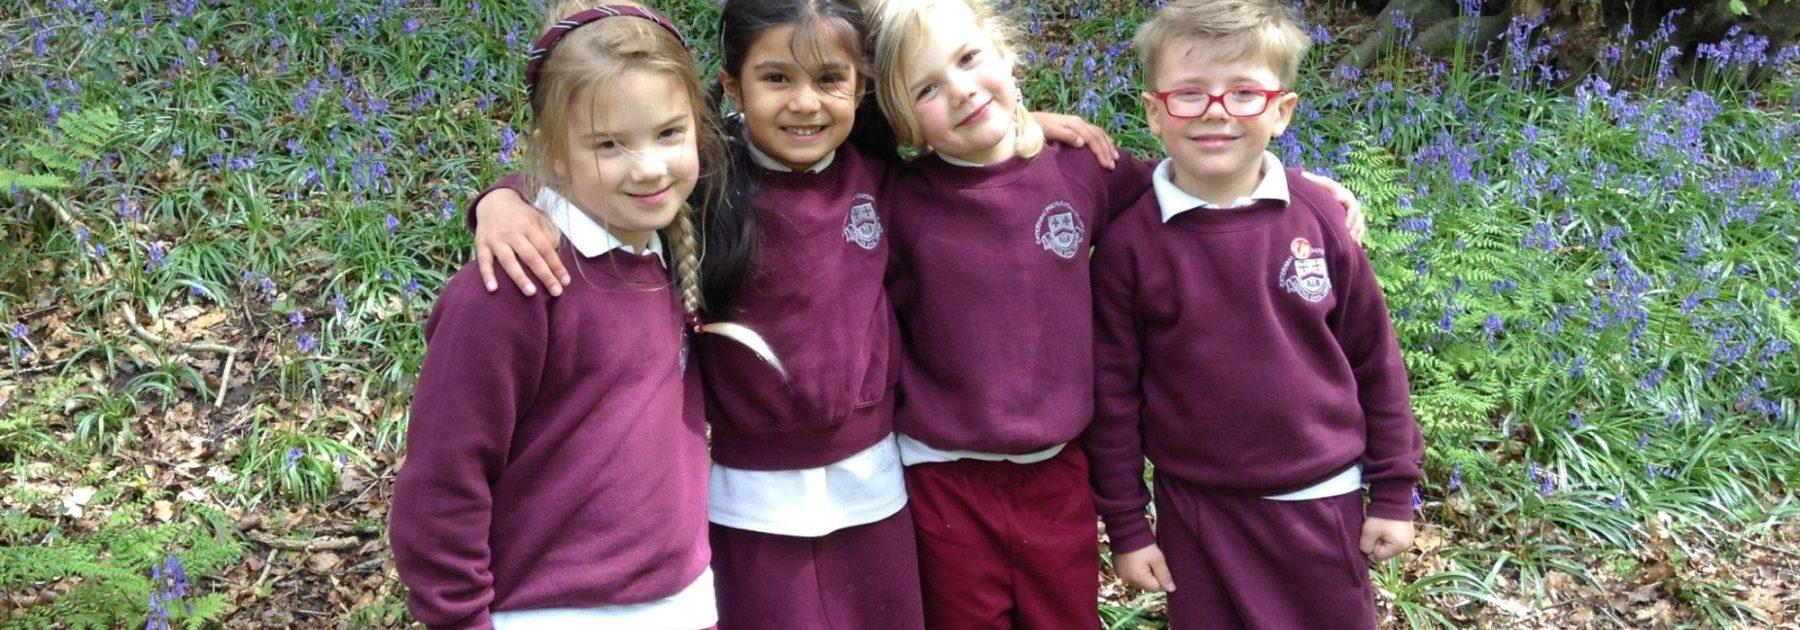 Caterham Welcomes Ben Purkiss as New Preparatory School Headmaster